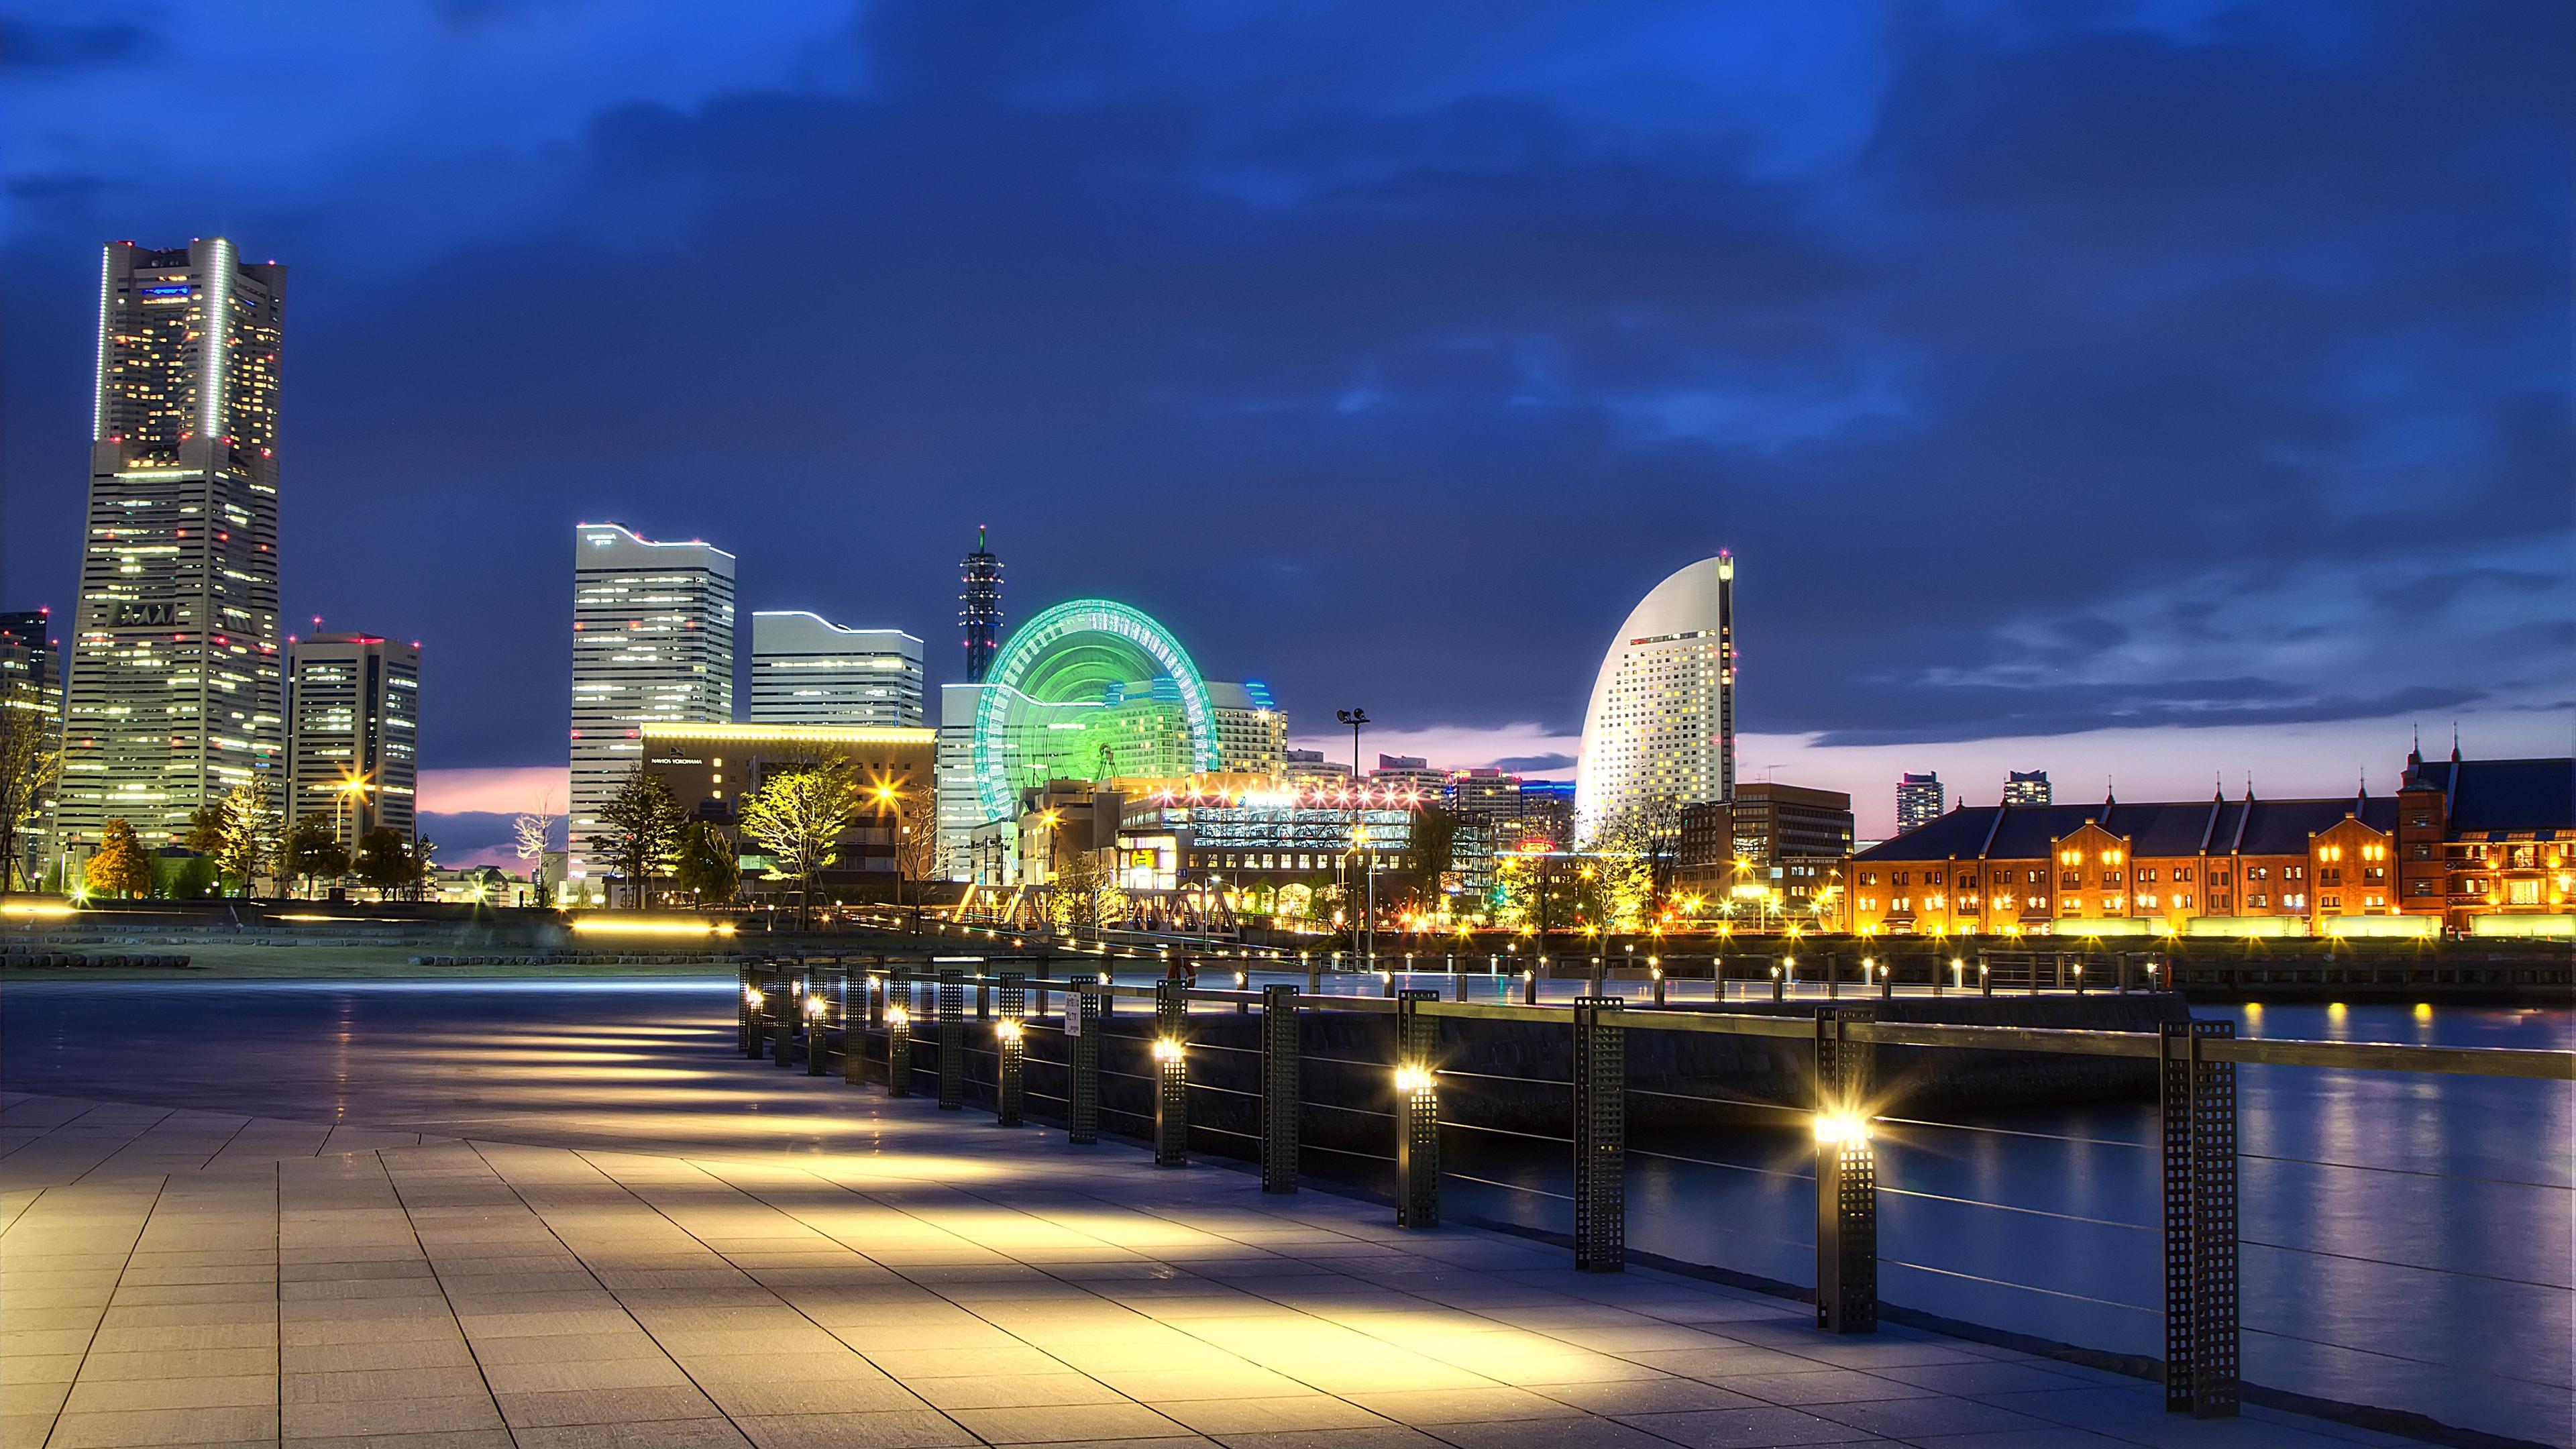 japan yokohama port metropolis night lights promenade bay 4k 1538065645 - japan, yokohama, port, metropolis, night, lights, promenade, bay 4k - Yokohama, port, Japan